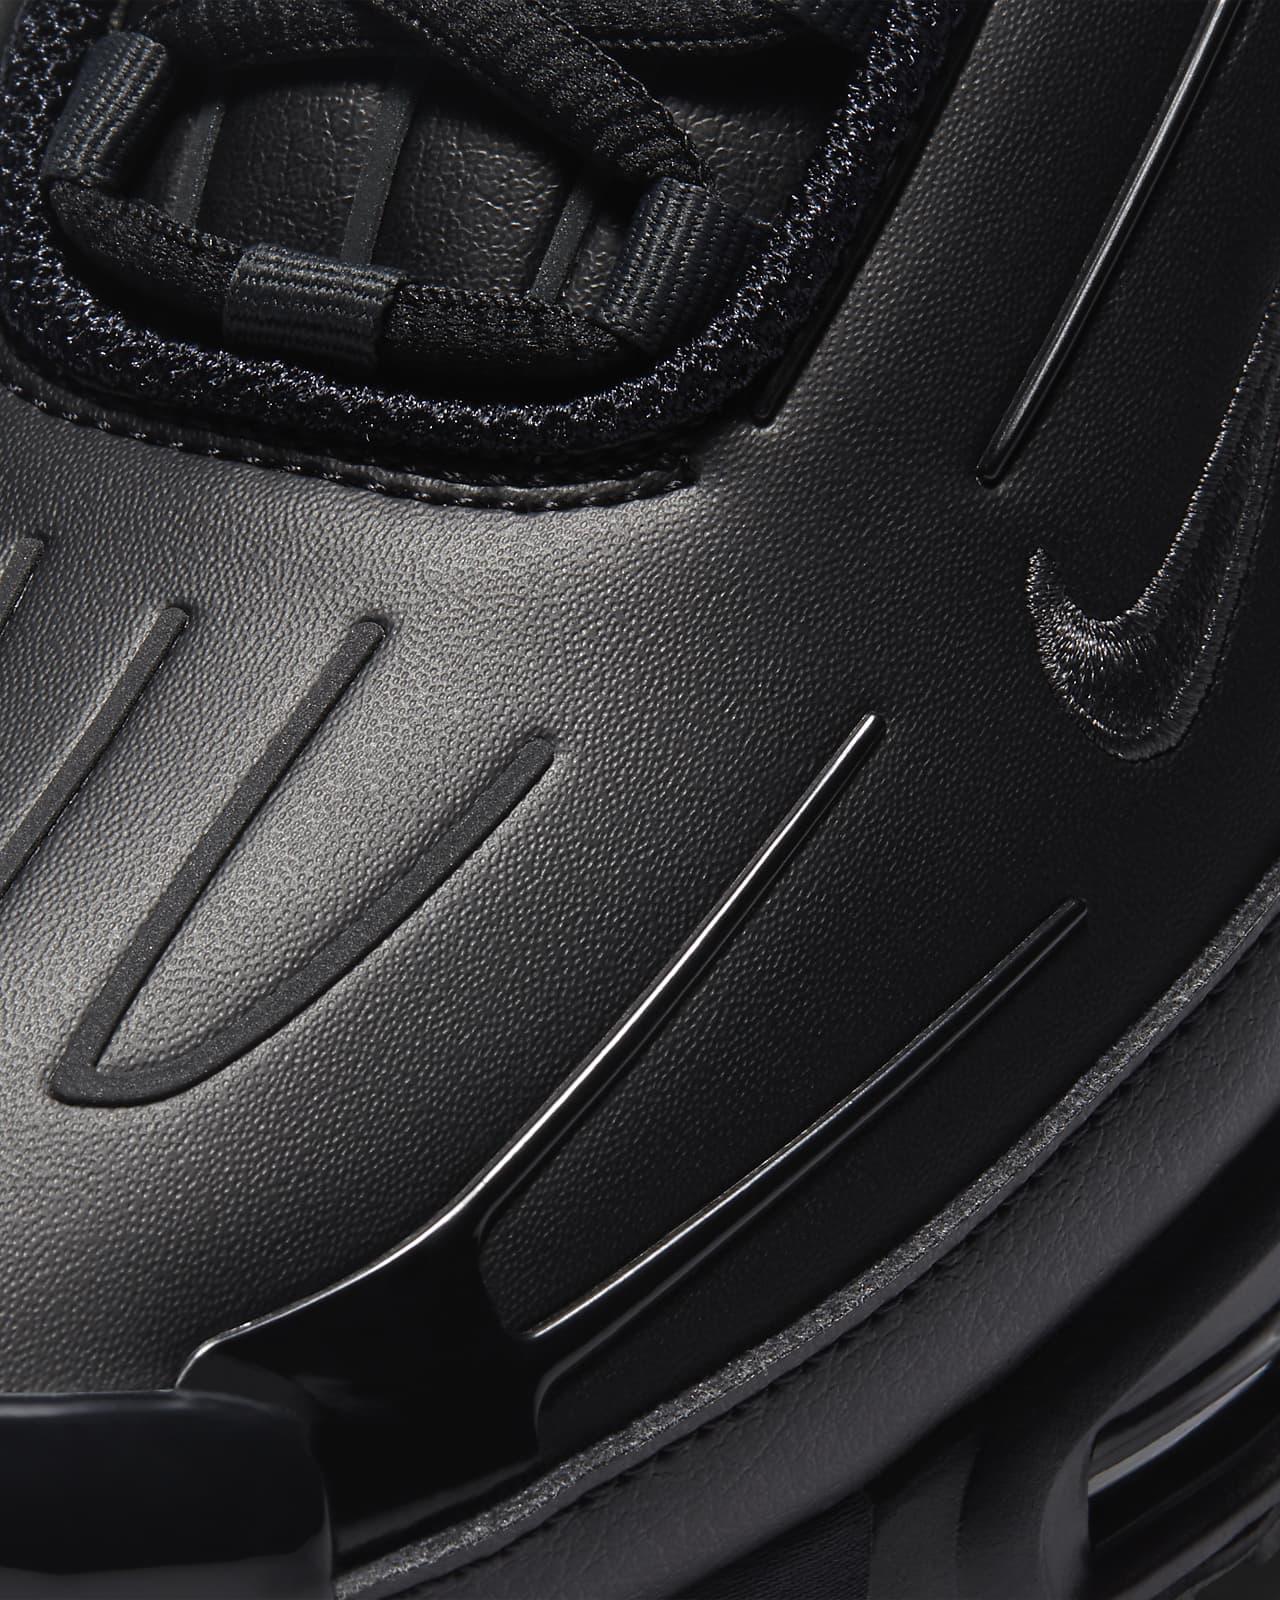 Nike Air Max Plus 3 Leather